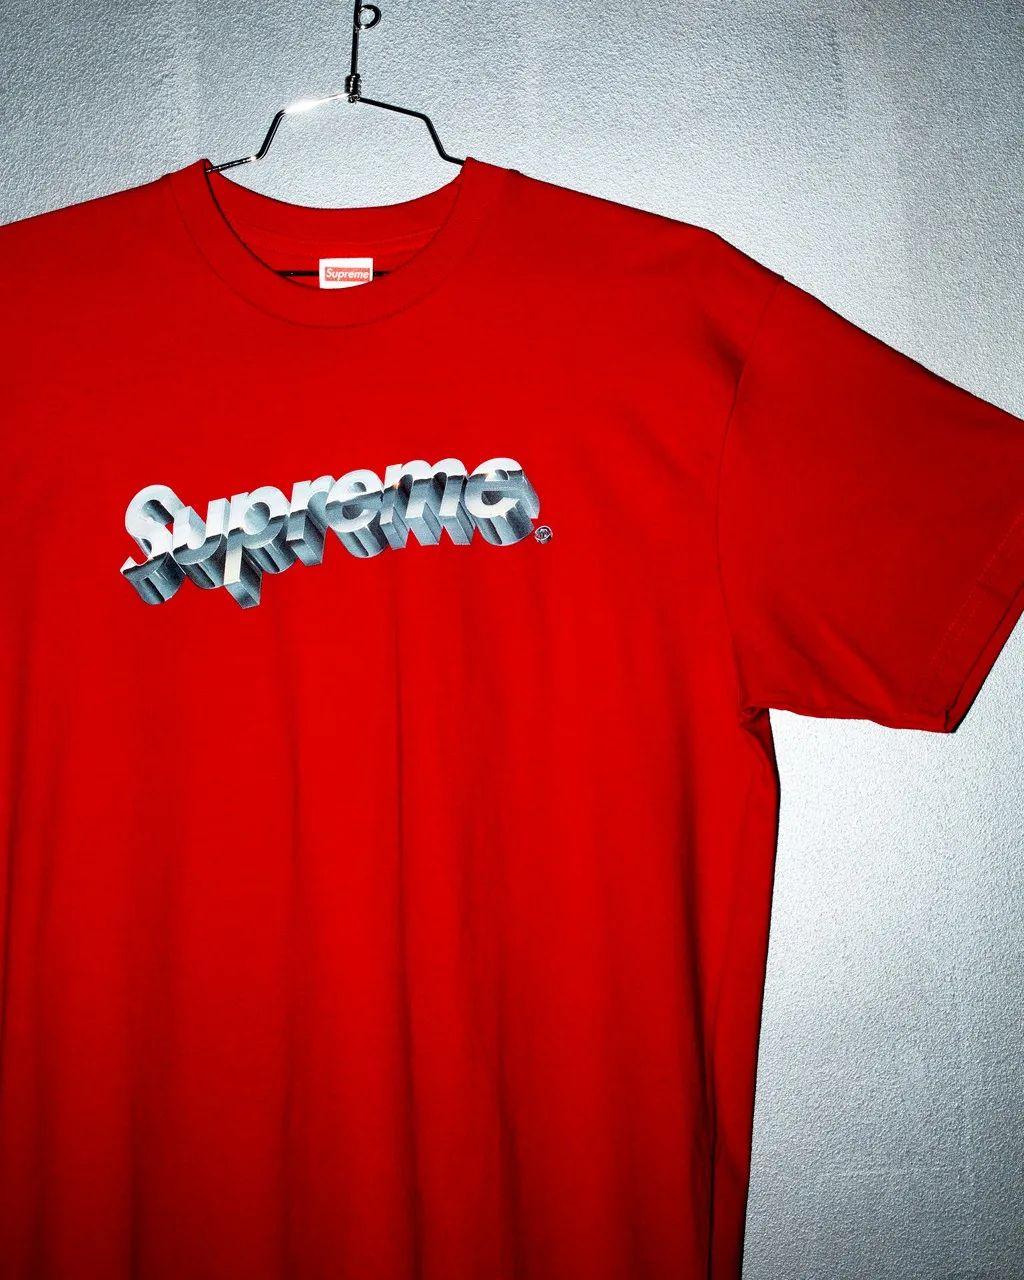 "T恤大家知道是什么吧?就是一个脑袋两根胳膊三个洞一套头就能穿身上的那种,最最普通的衣服样式。然后,有一个温哥华90后收集的一些T恤,要在知名拍卖行Christie's拍卖了,预估价格200美金!在普通人眼中,这些T恤跟街上20刀一件的没有区别,如果有,那就是印花的区别。偏偏就是这个印花的区别,让这些T恤身价暴增,因为它们都印着一个单词""Supreme""。现年21岁的温哥华小哥JamesBogart,自2014年开始收集相关单品,至今为止,..."